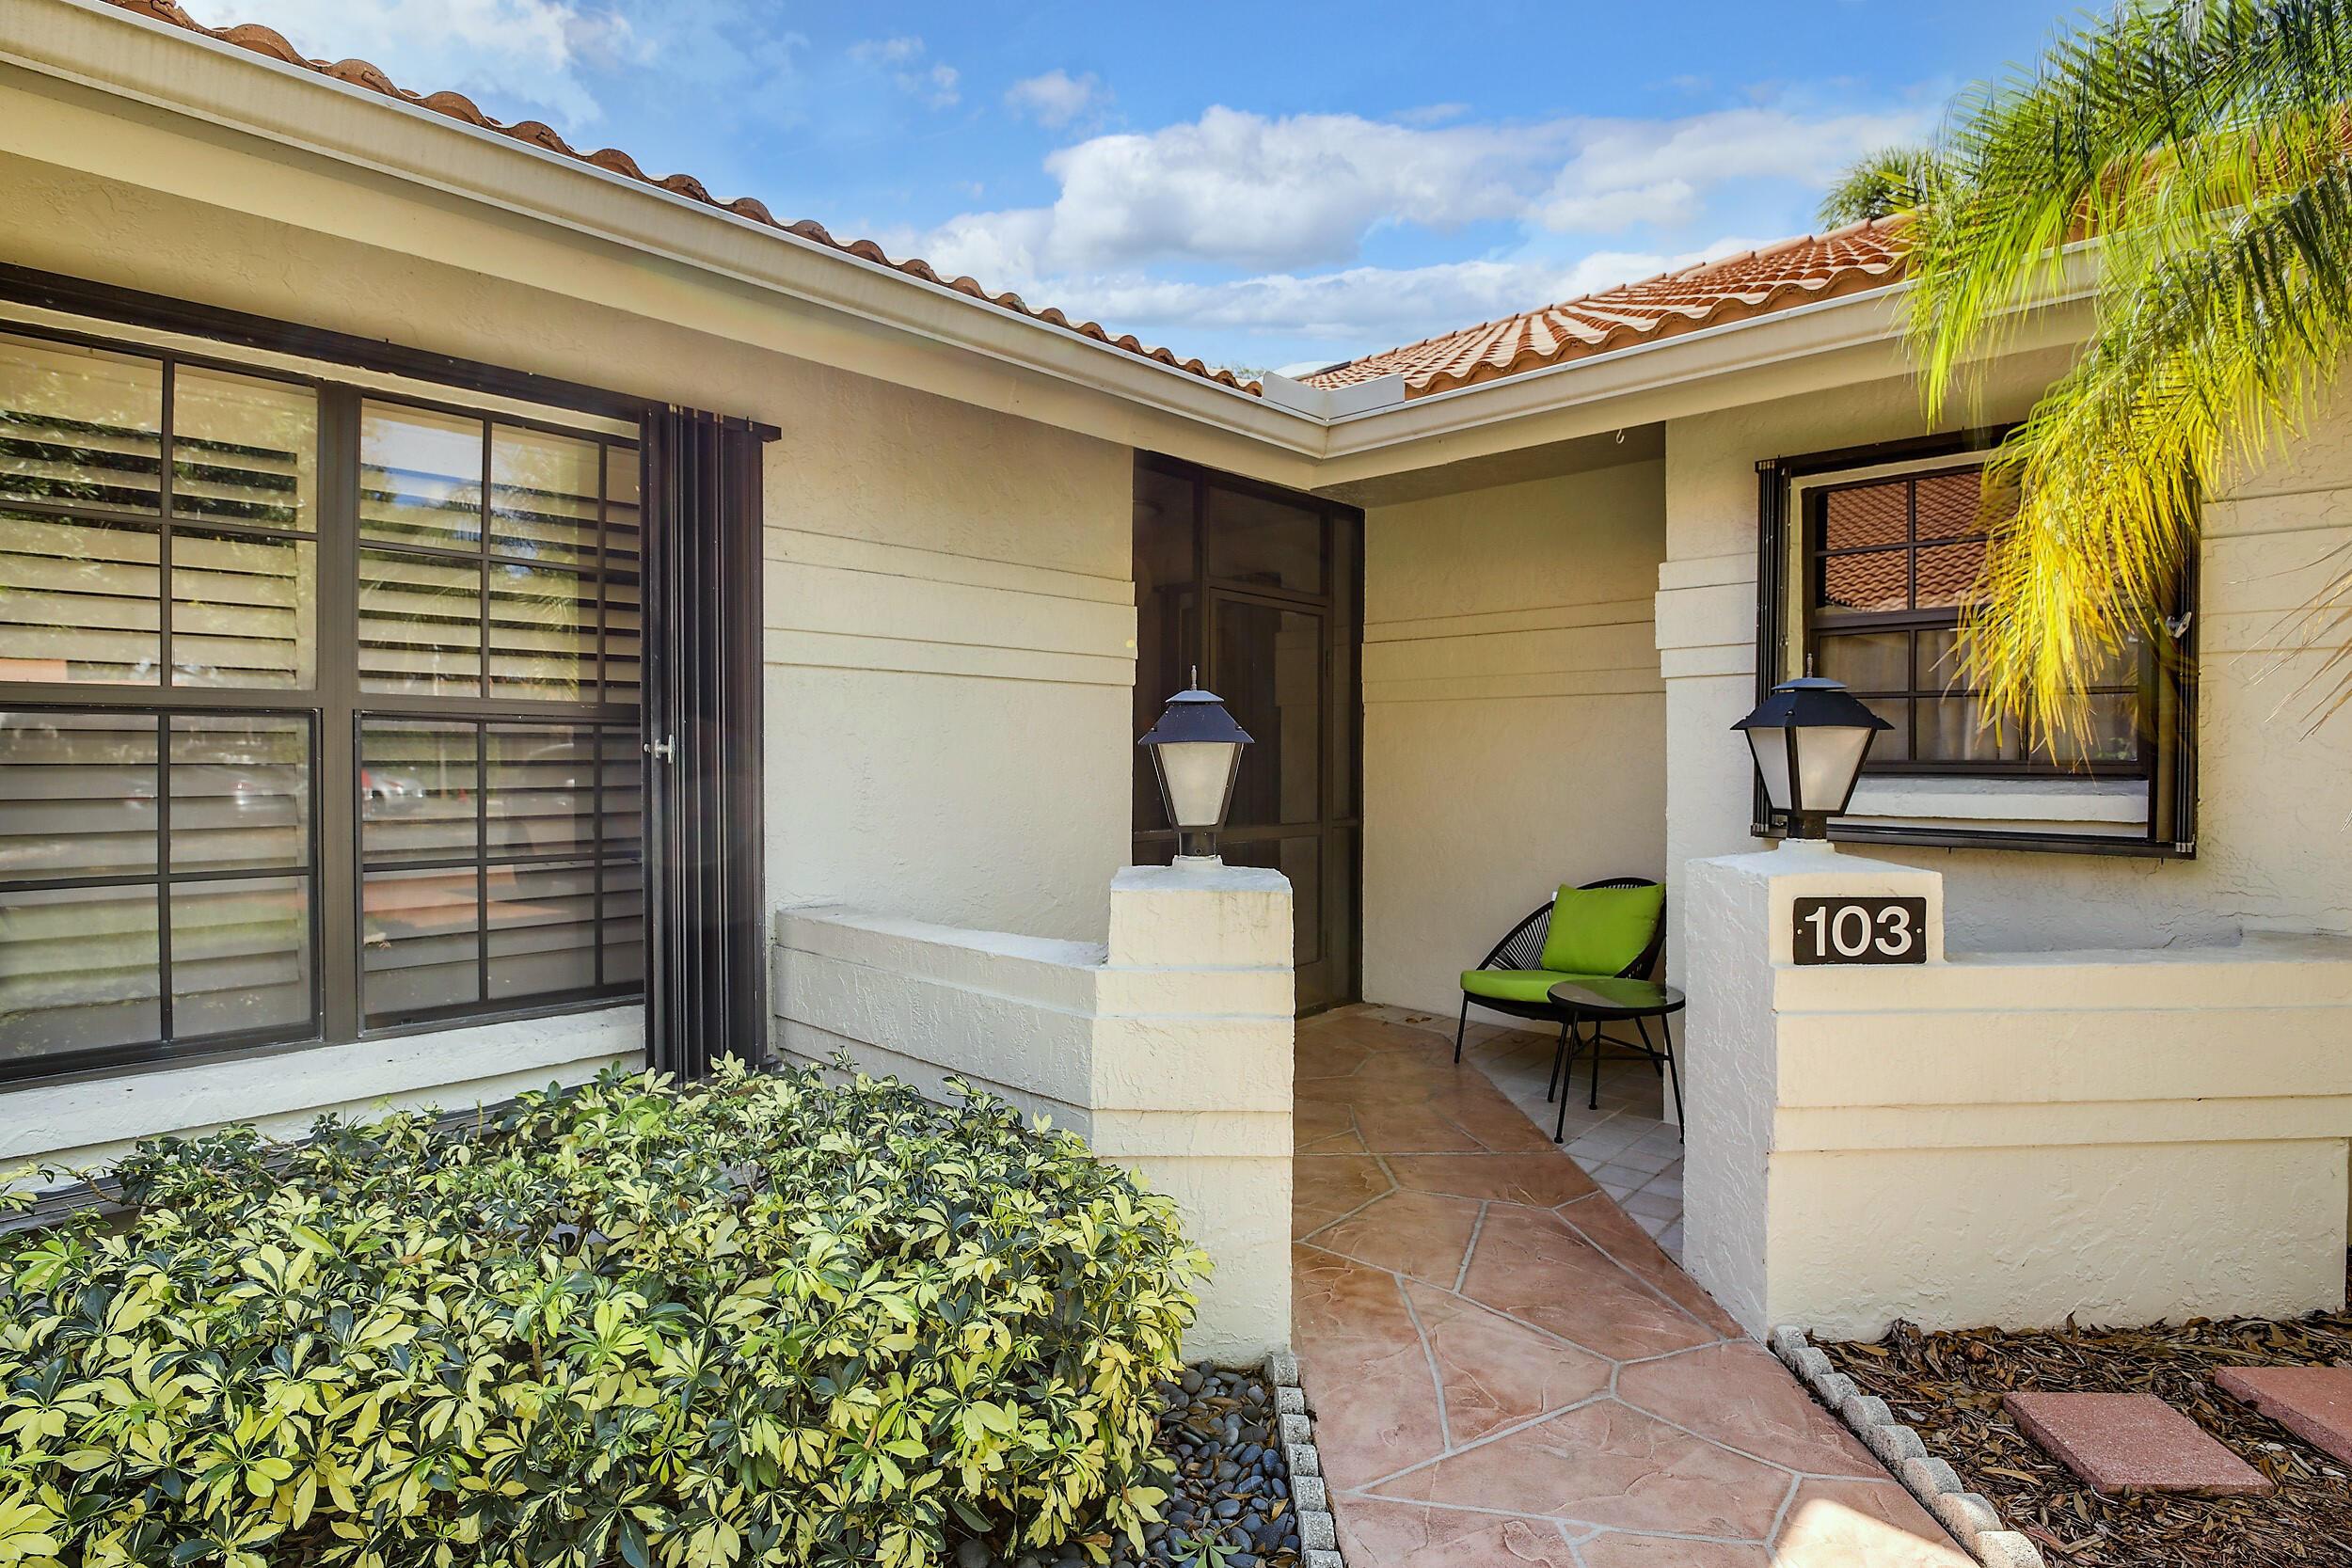 9879 Pavarotti Terrace 103 Boynton Beach, FL 33437 photo 3